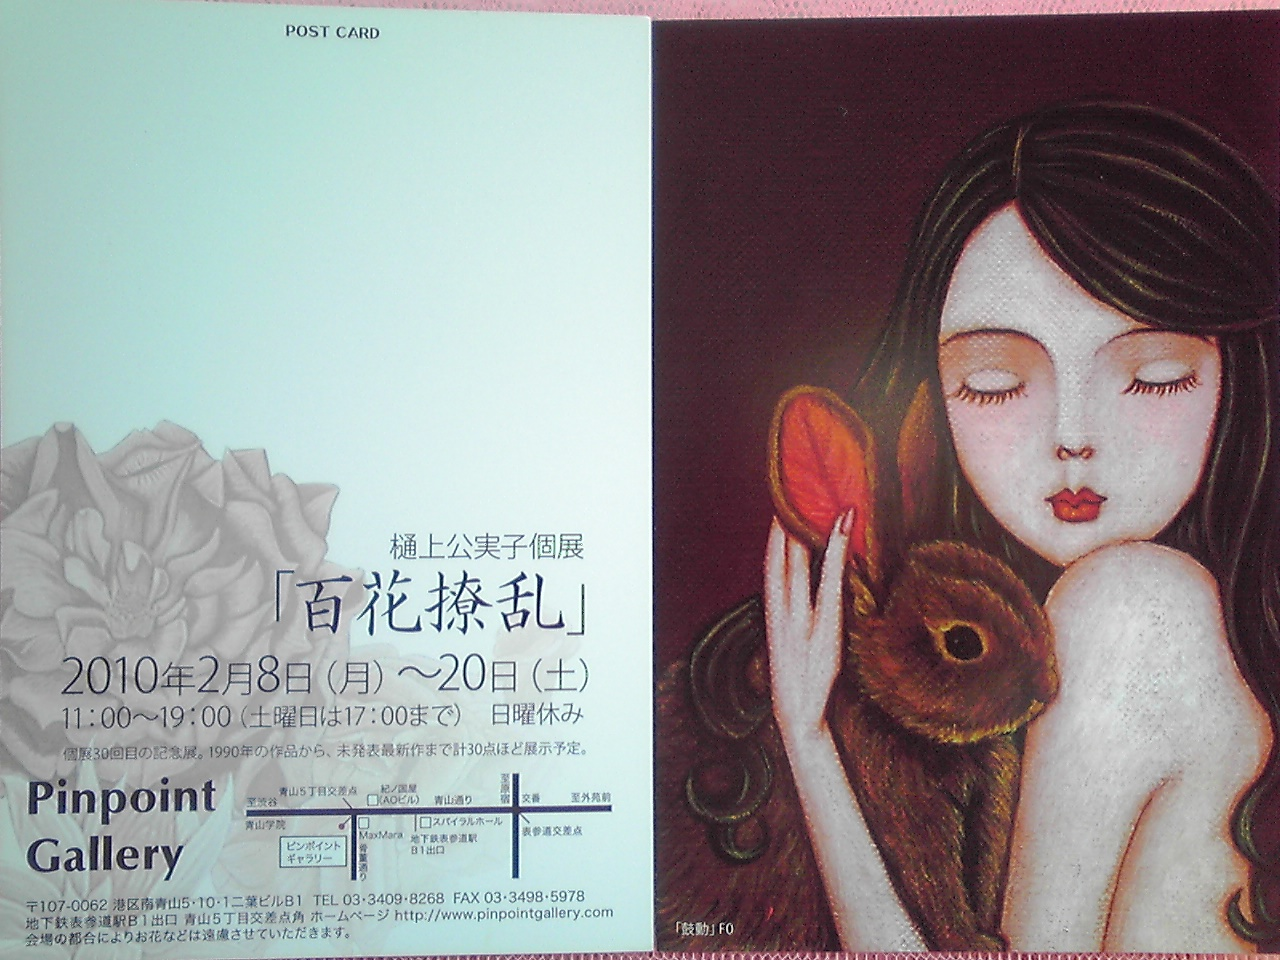 【オススメ】樋上公実子個展「百花繚乱」